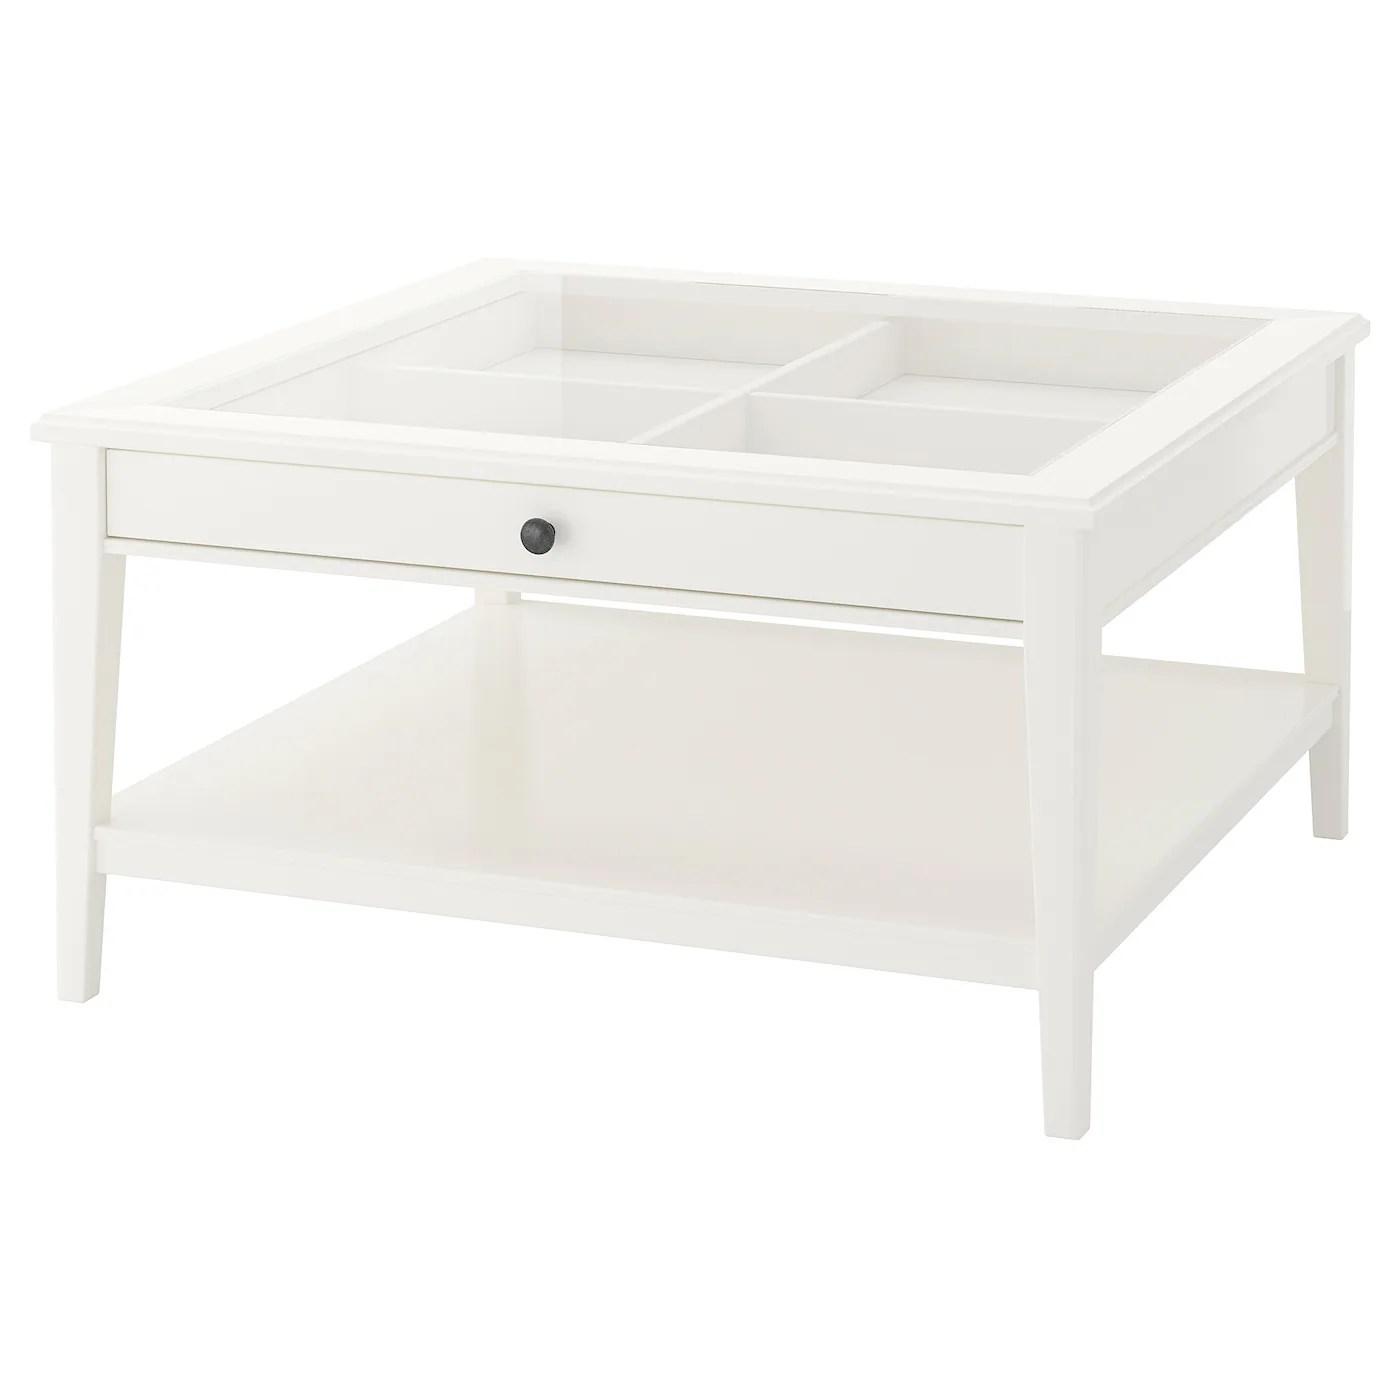 liatorp table basse blanc verre 93x93 cm